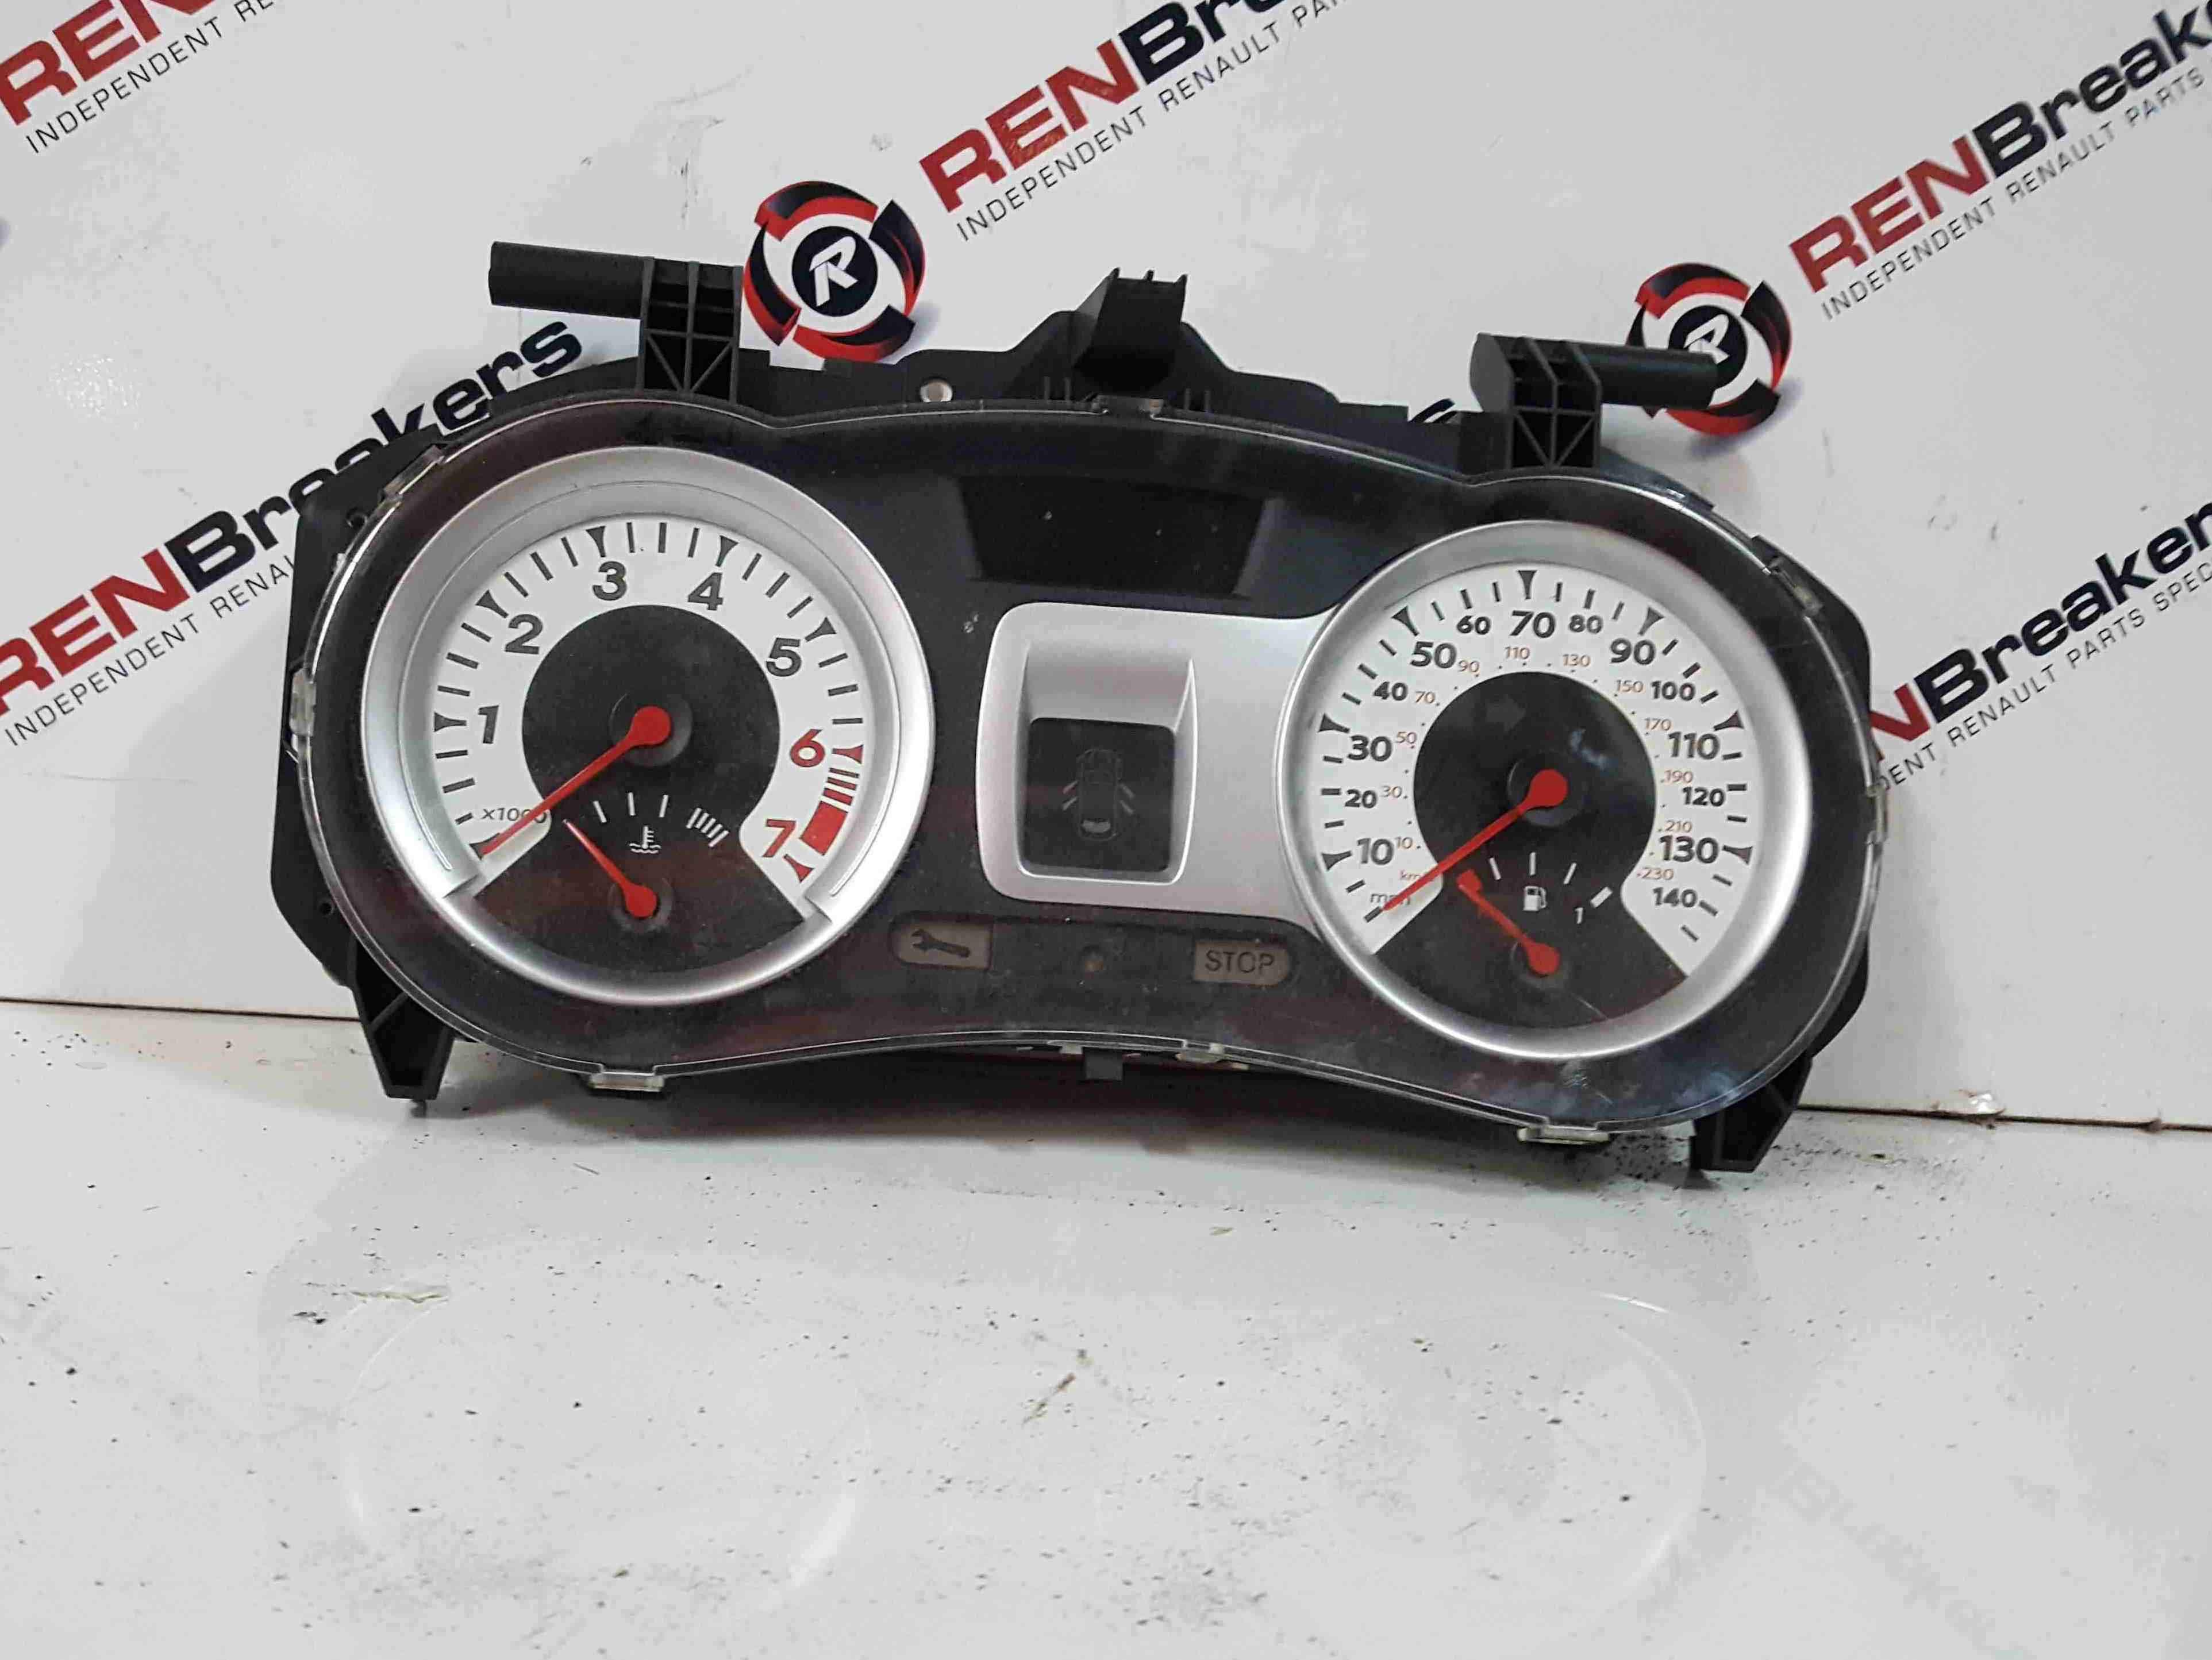 Renault Clio MK3 2005-2012 Instrument Panel Dials Clocks 133K 8200859342